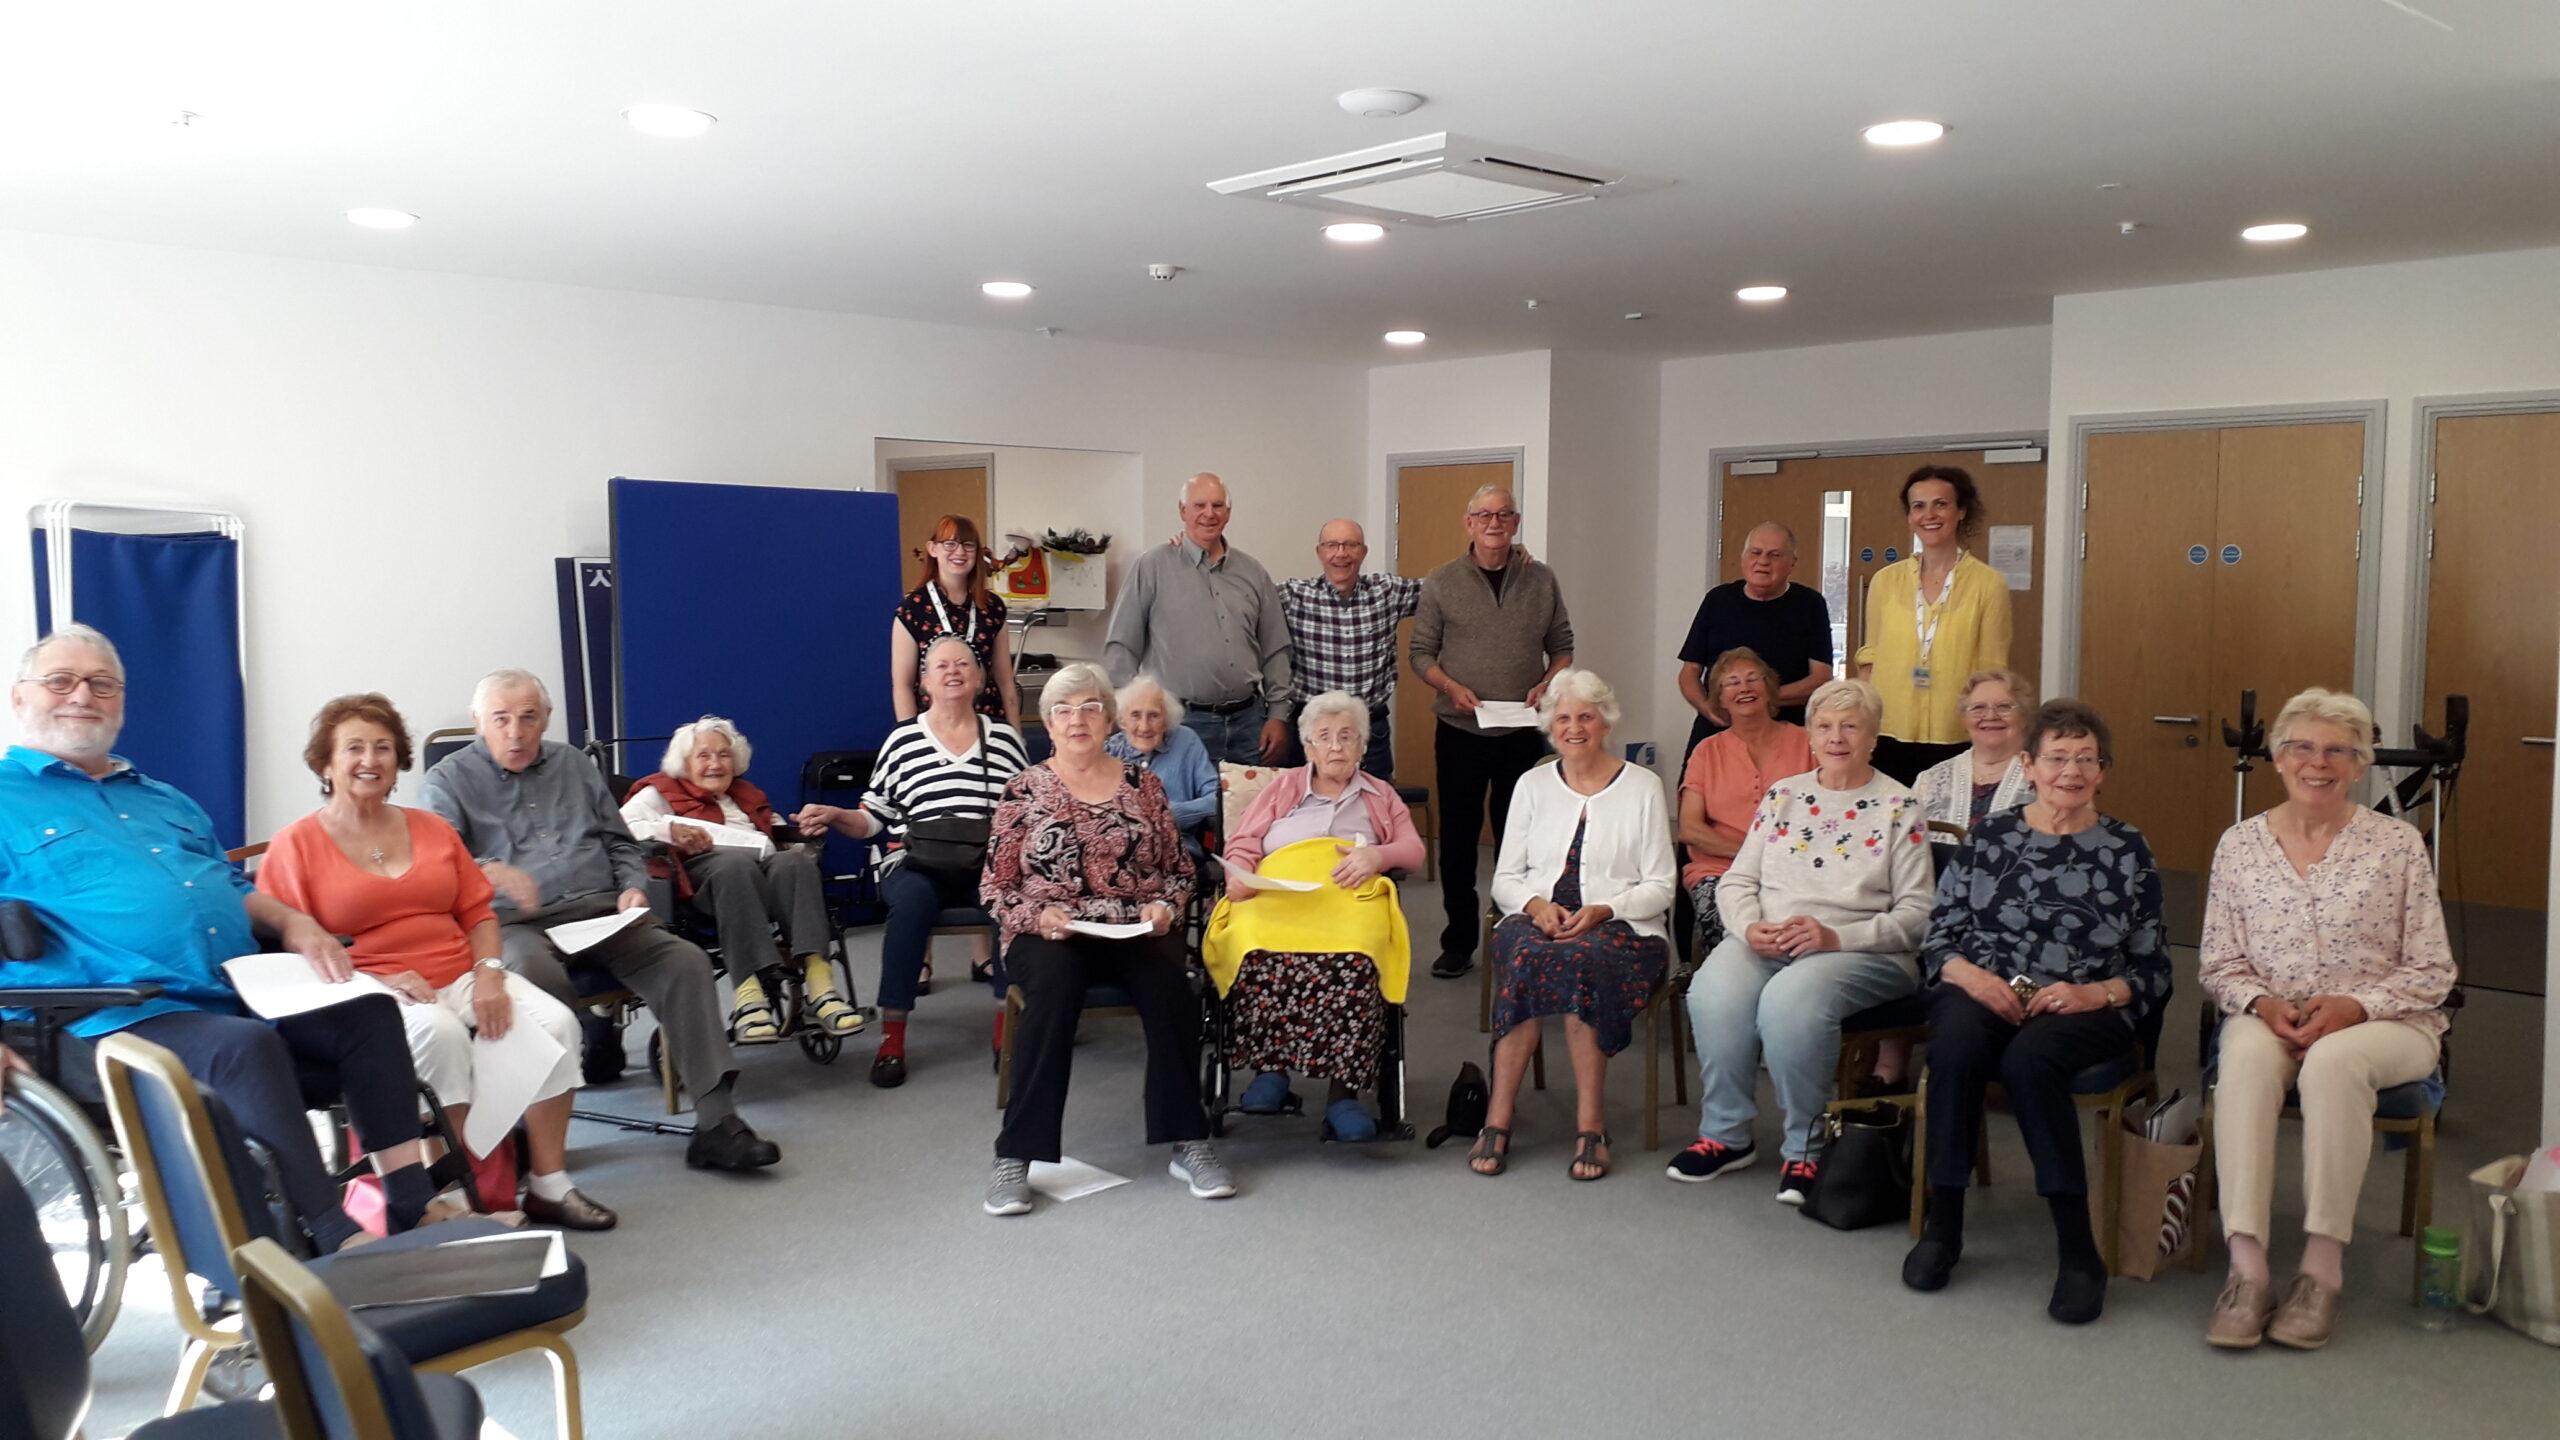 Press Release: Grant provides lifeline to Whiteley's community choir